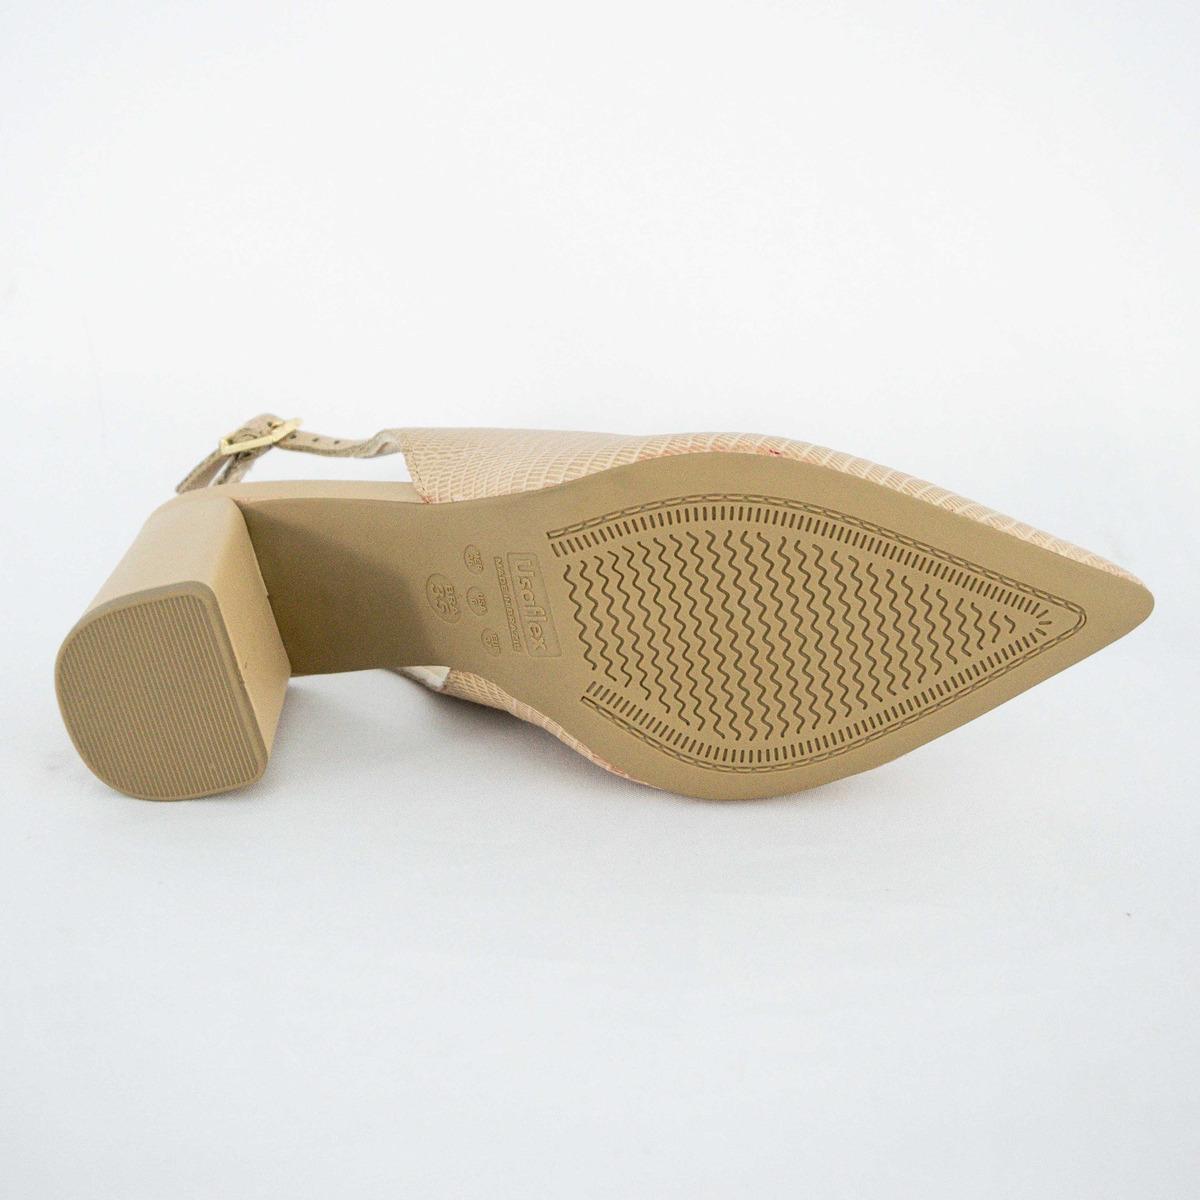 bf9f83b68 sapato slick back usaflex ab6705 chanel nude 100% original. Carregando zoom.